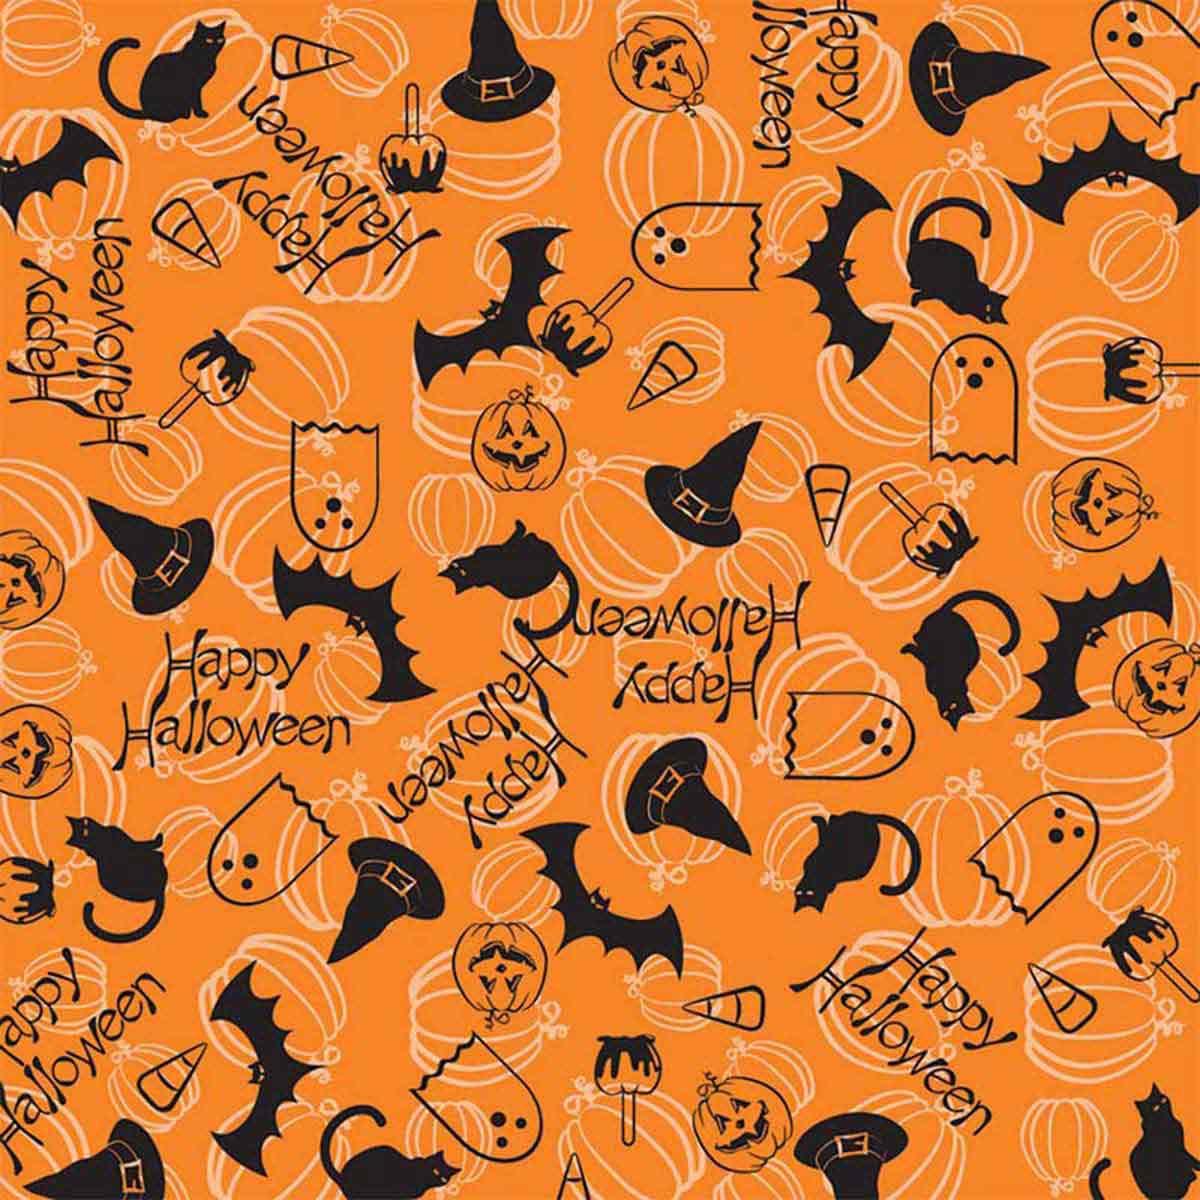 Happy Halloween Bandanna for Dogs